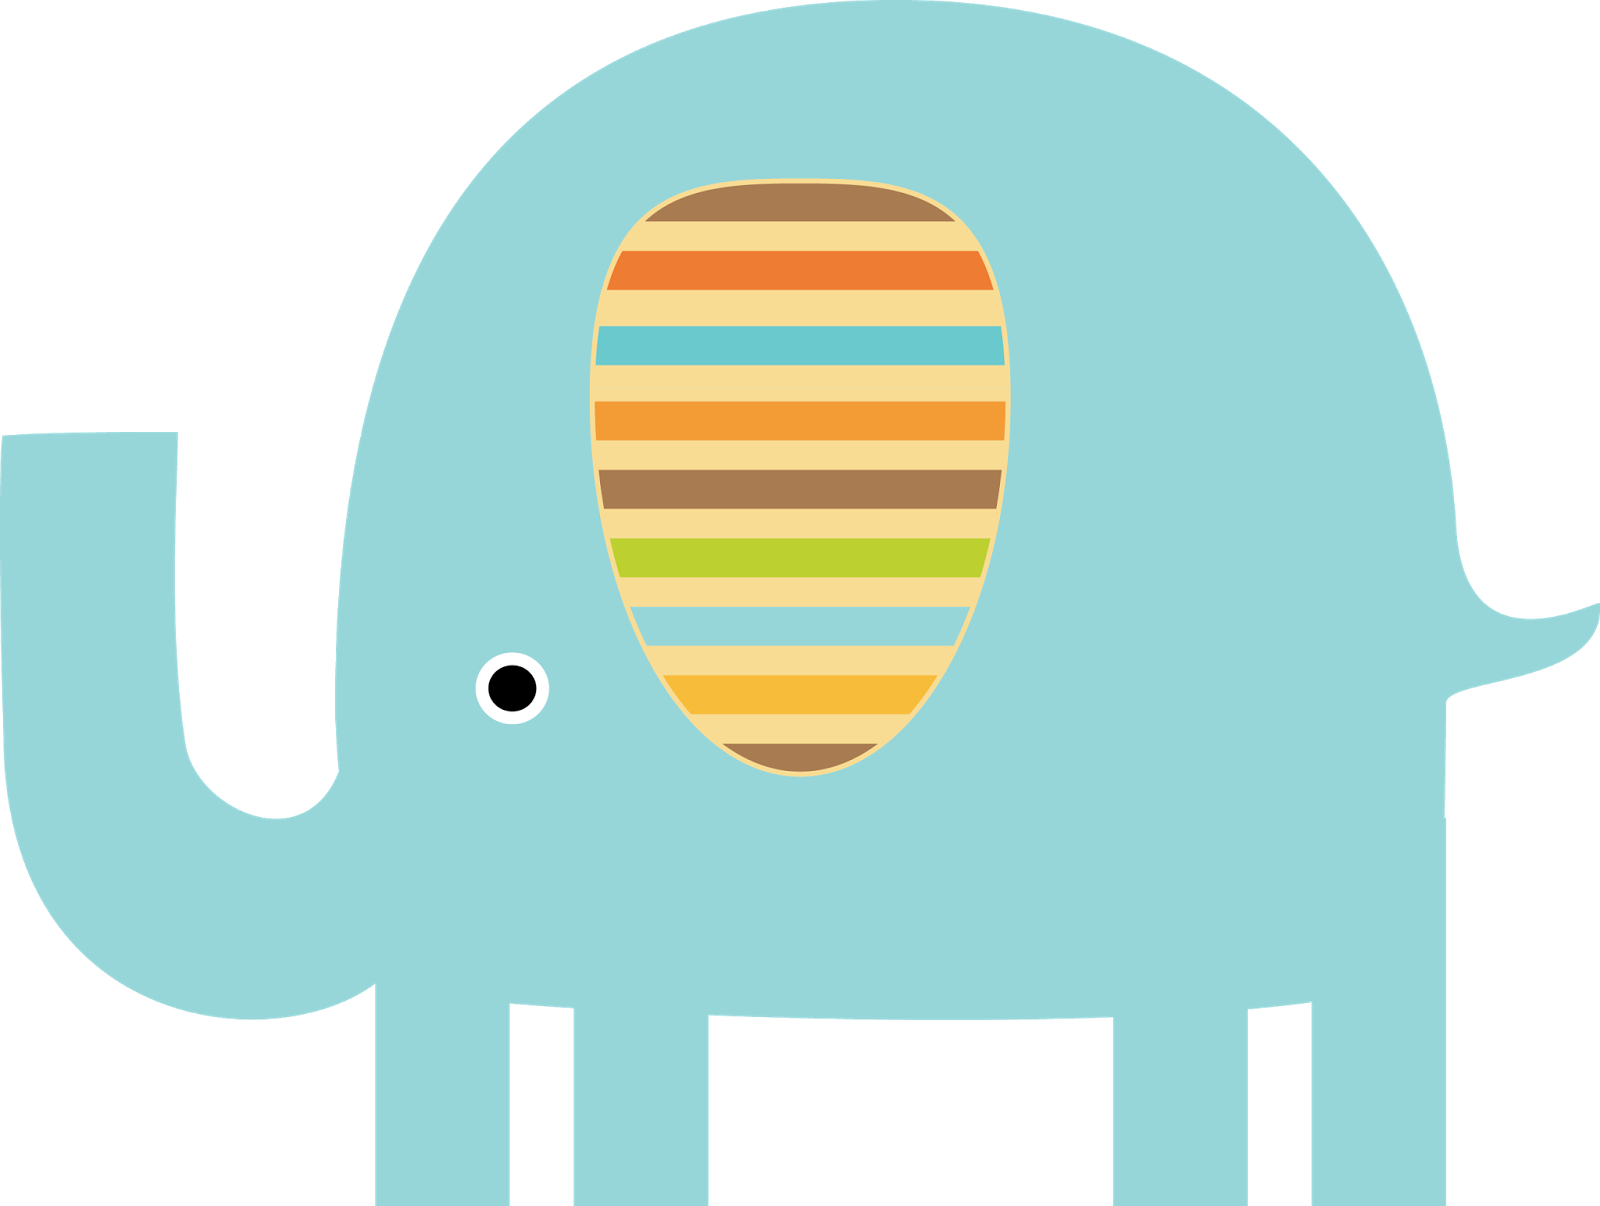 Giggle and print mod. Manatee clipart emoji